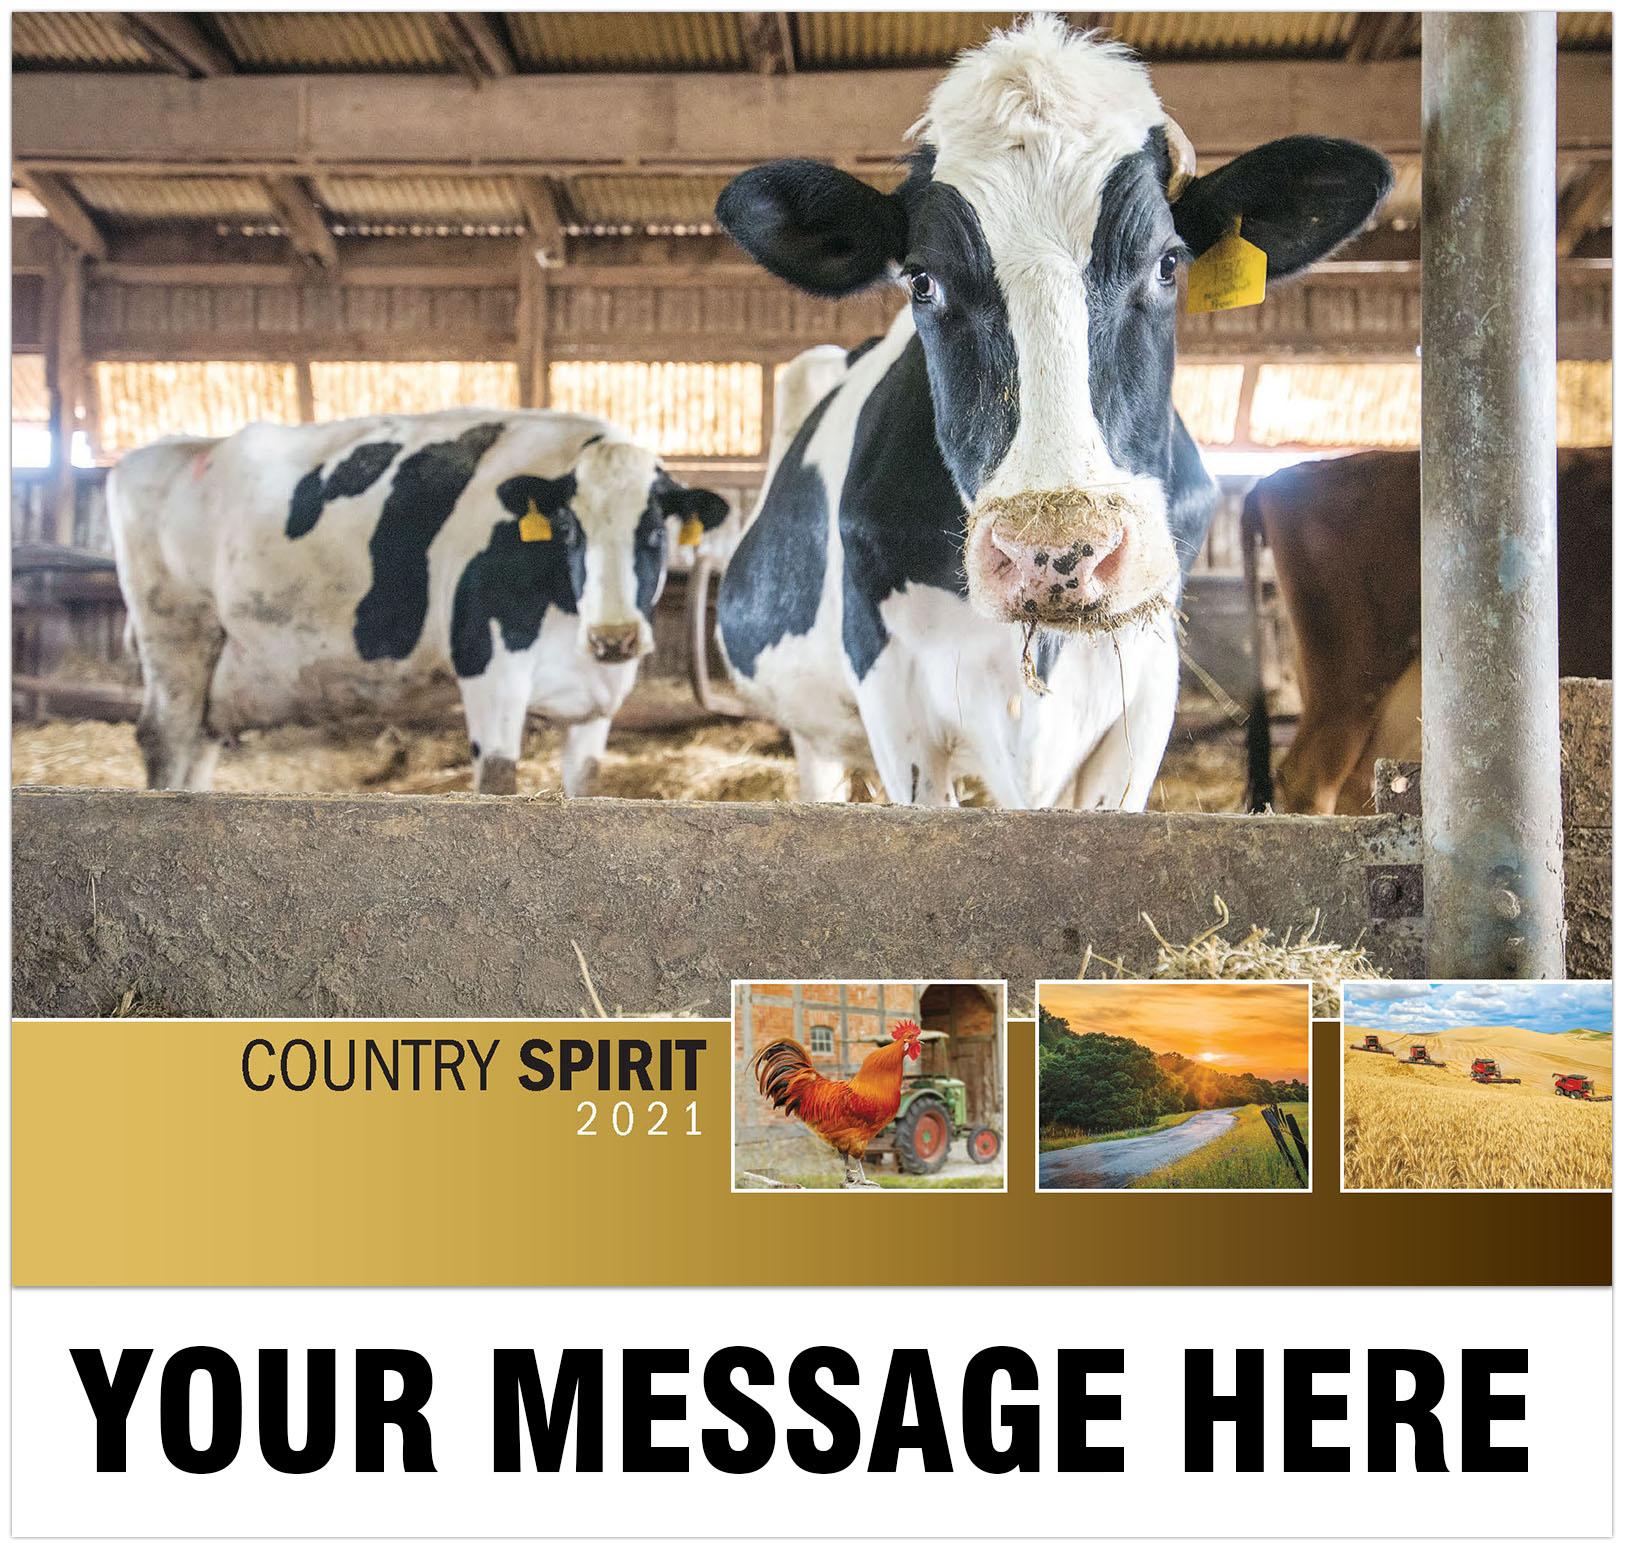 2021 Country Spirit Promotional Calendar